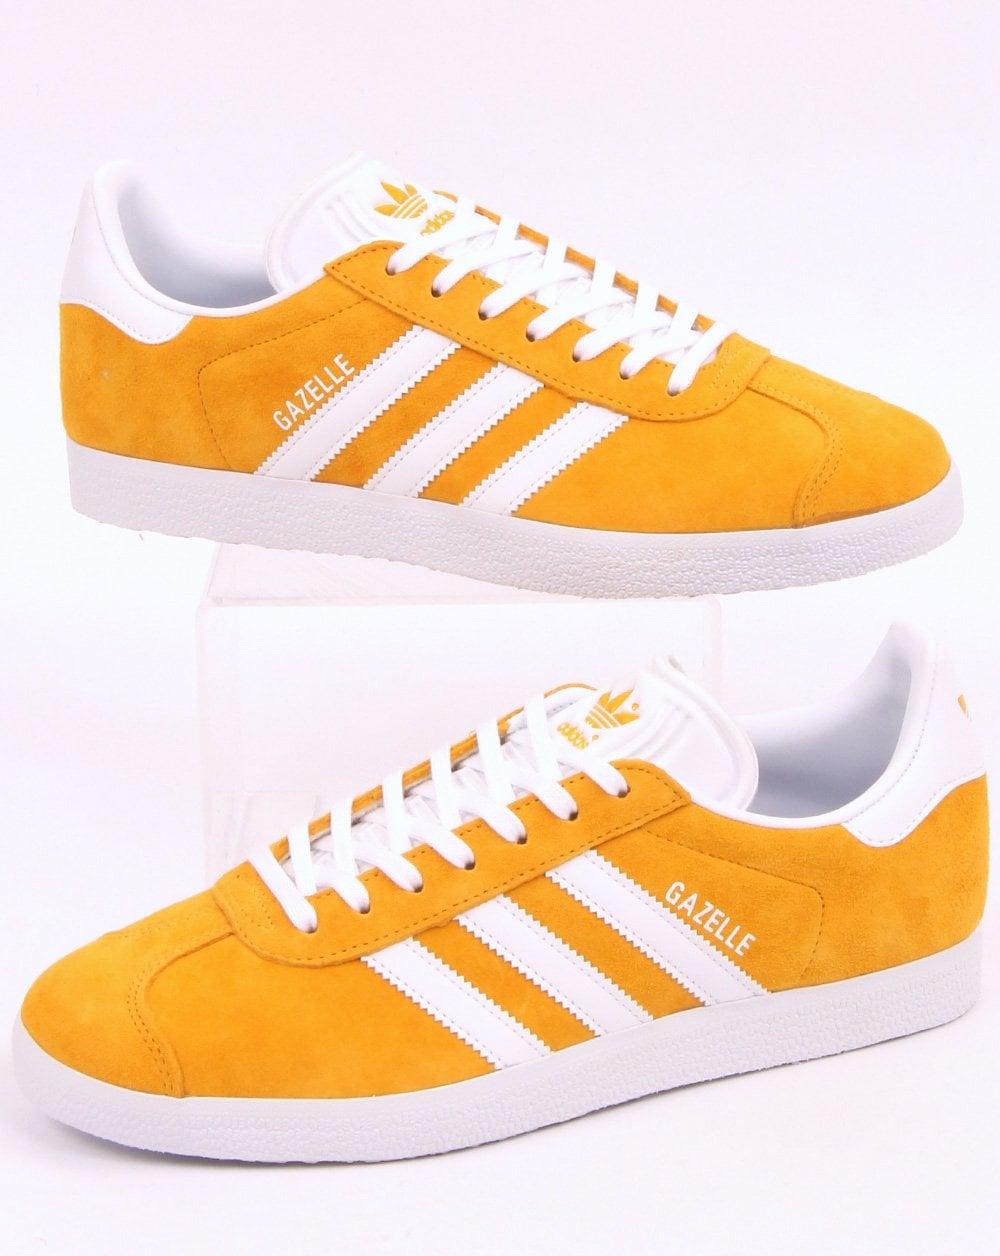 Adidas Gazelle Trainers Golden Yellow